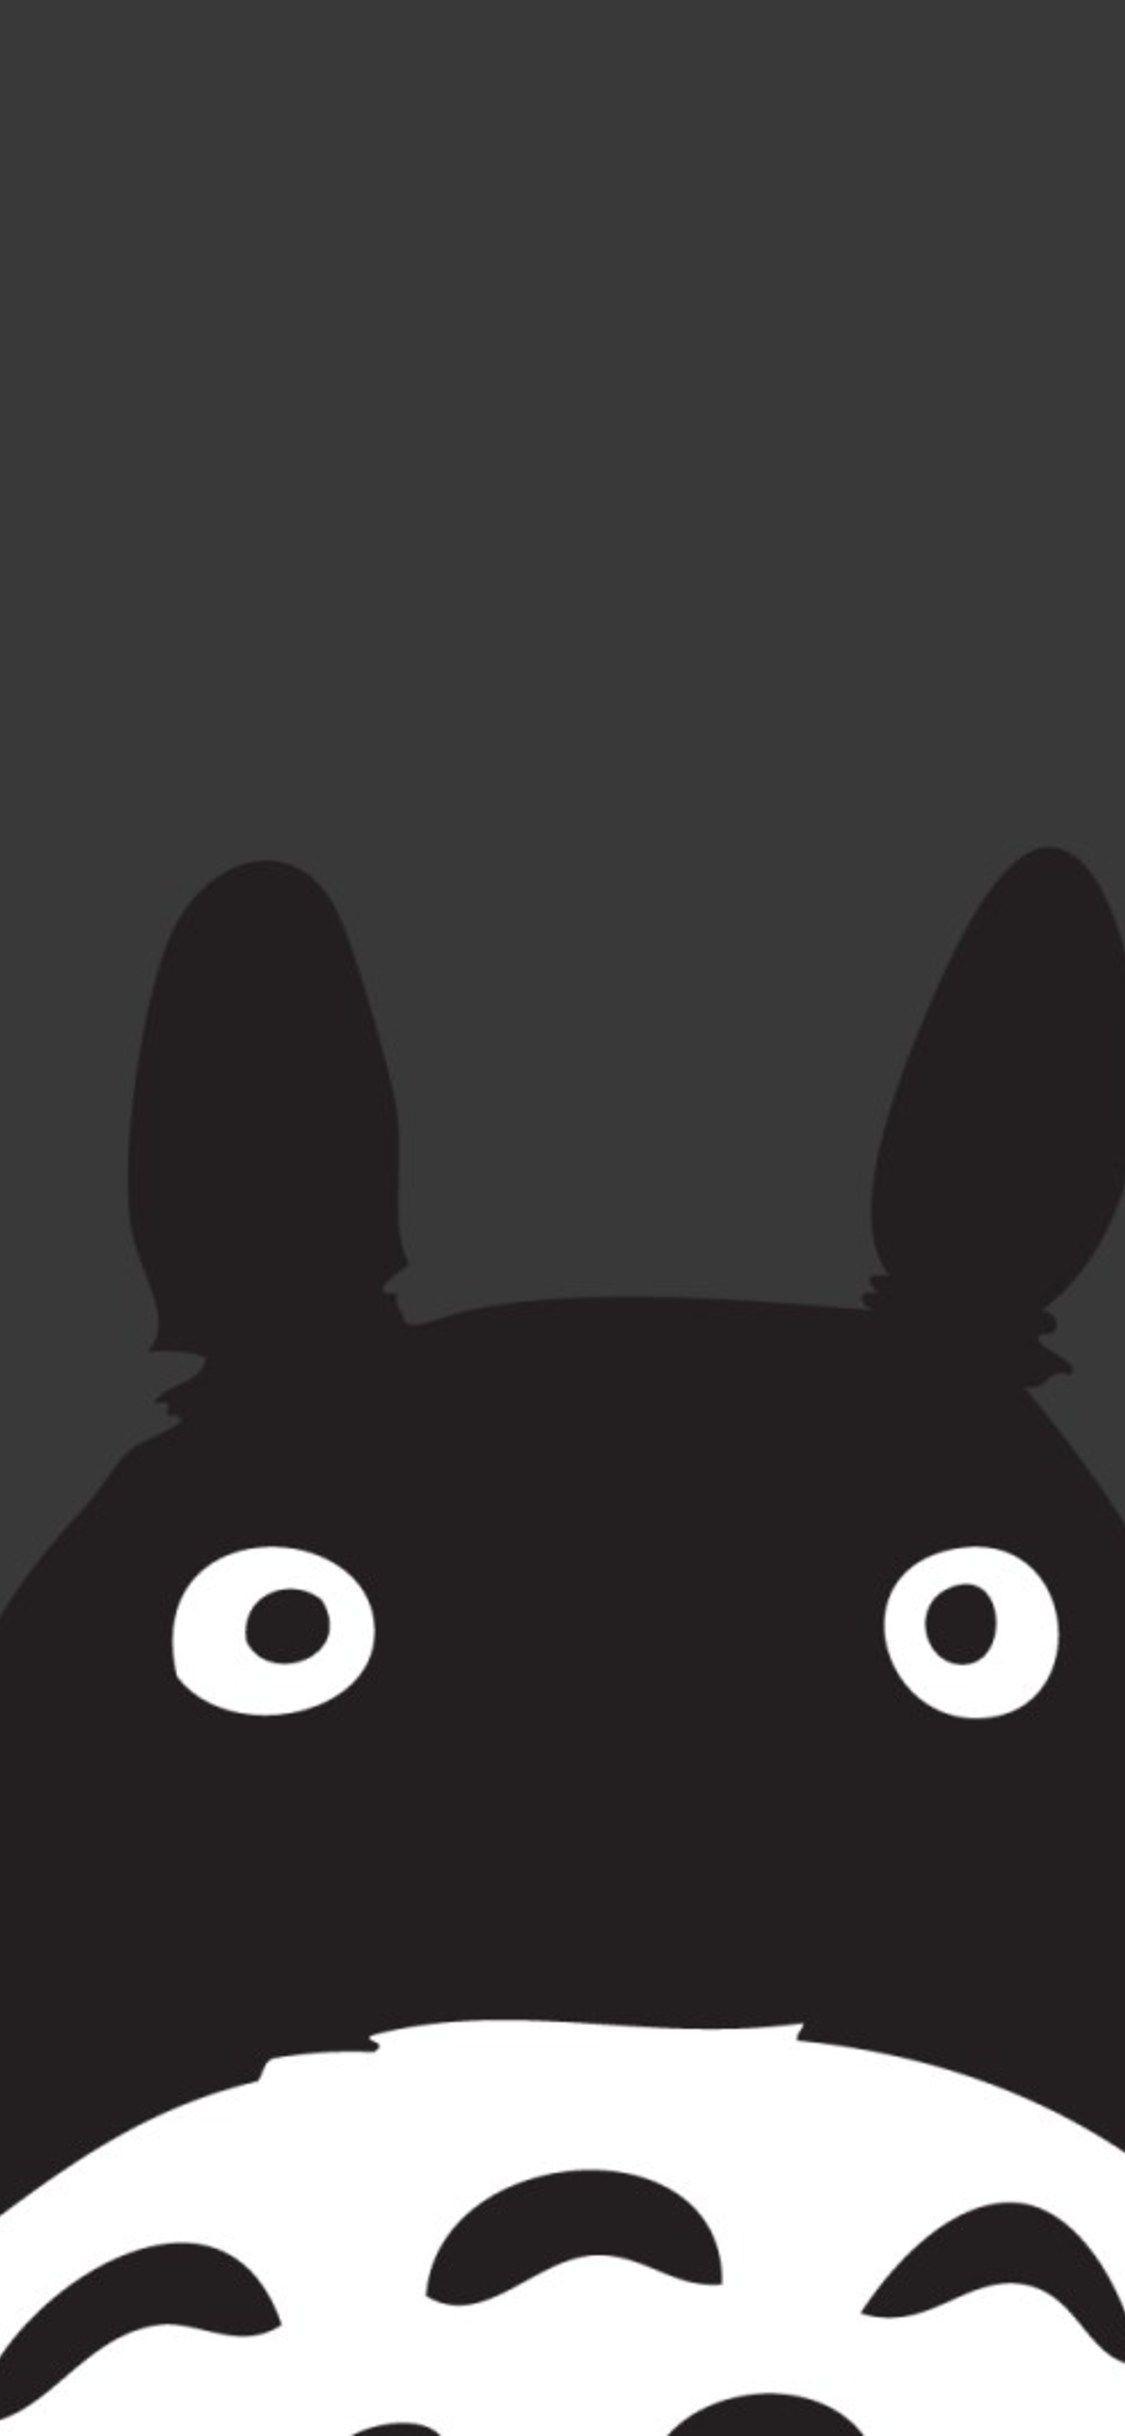 50 best free totoro iphone wallpapers wallpaperaccess - Totoro wallpaper iphone ...